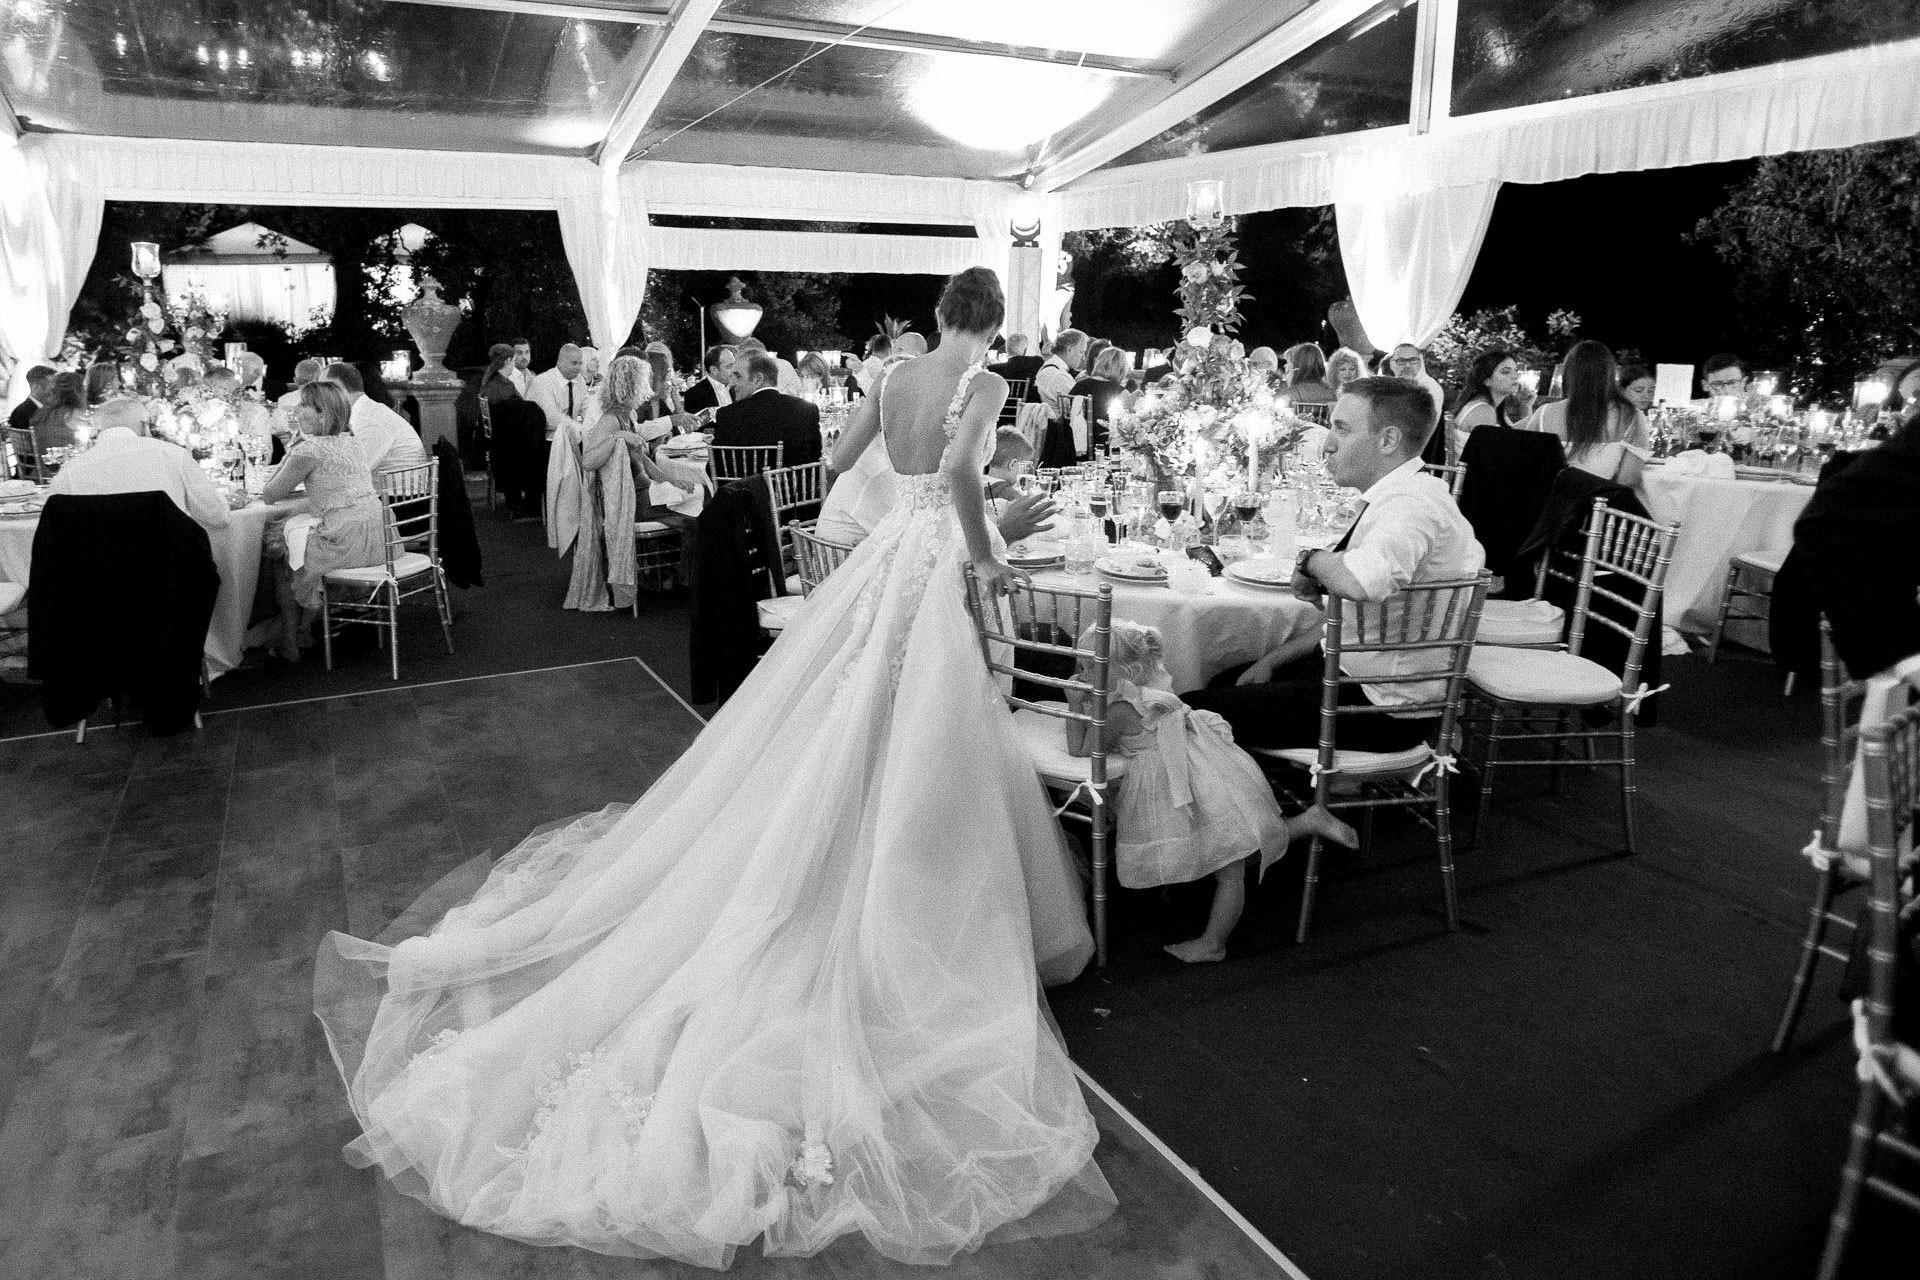 florence italy wedding venue